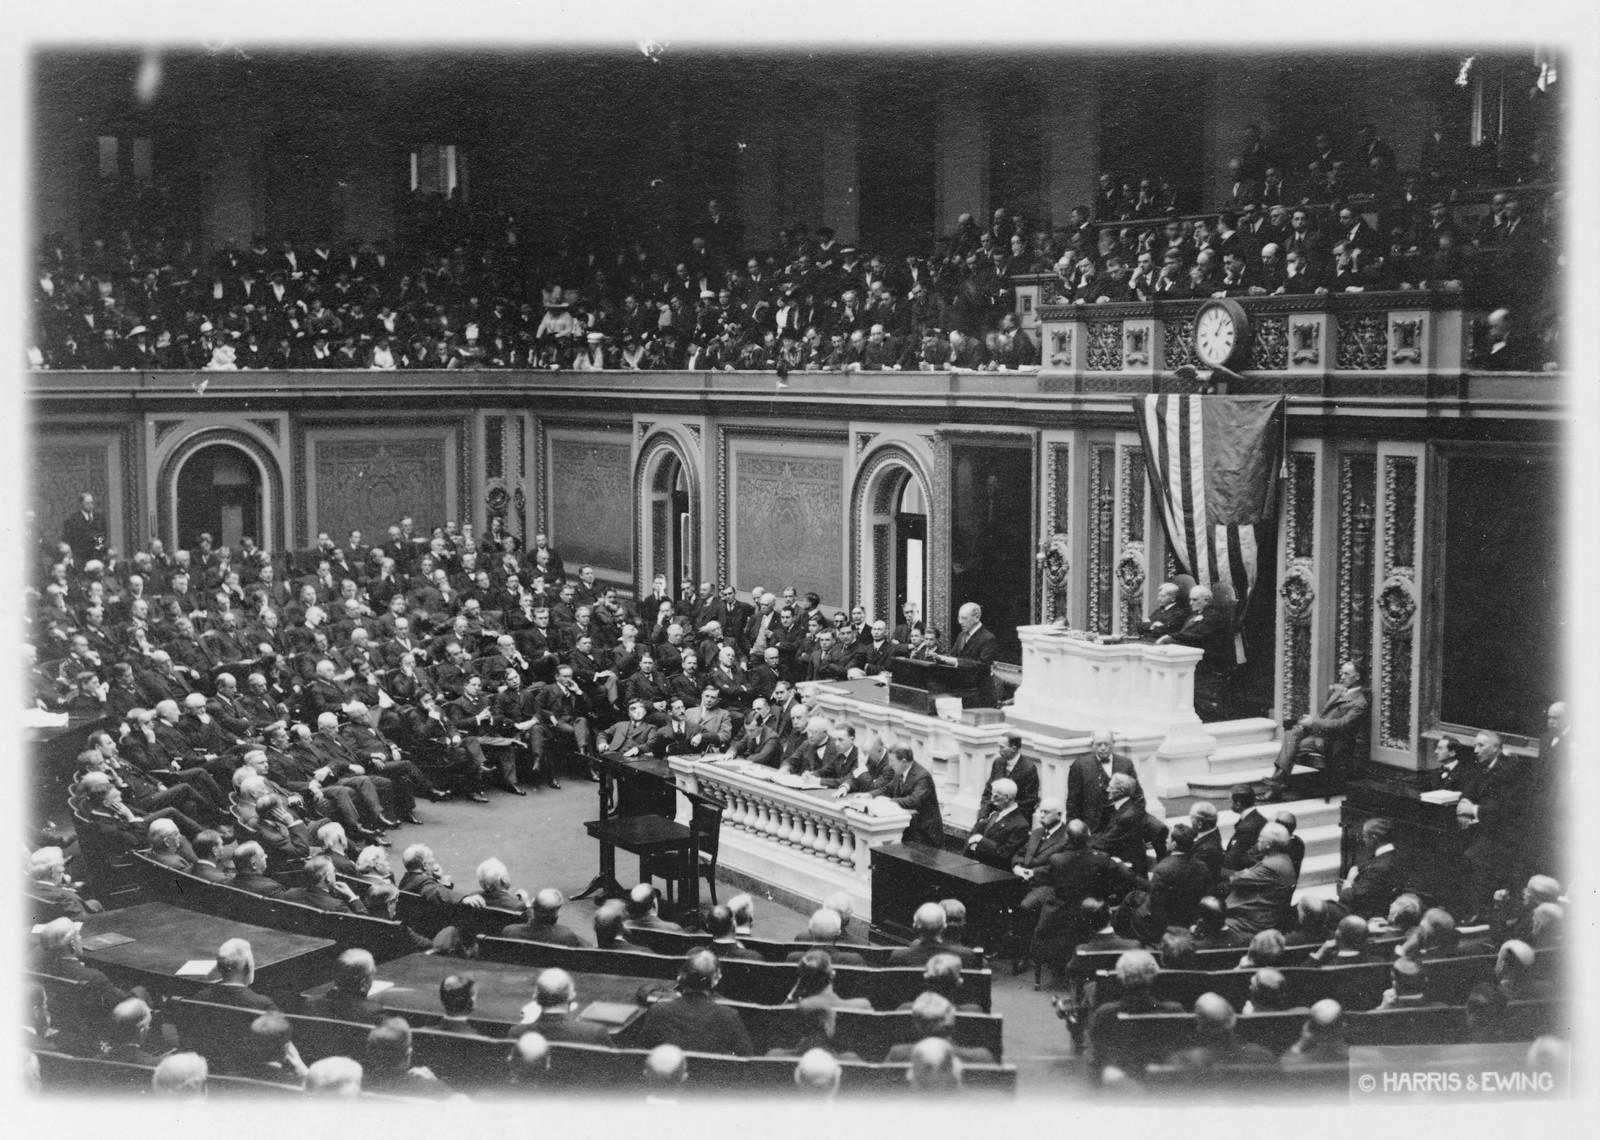 No Known Restrictions: President Woodrow Wilson Addresses Congress, 1917 (LOC)